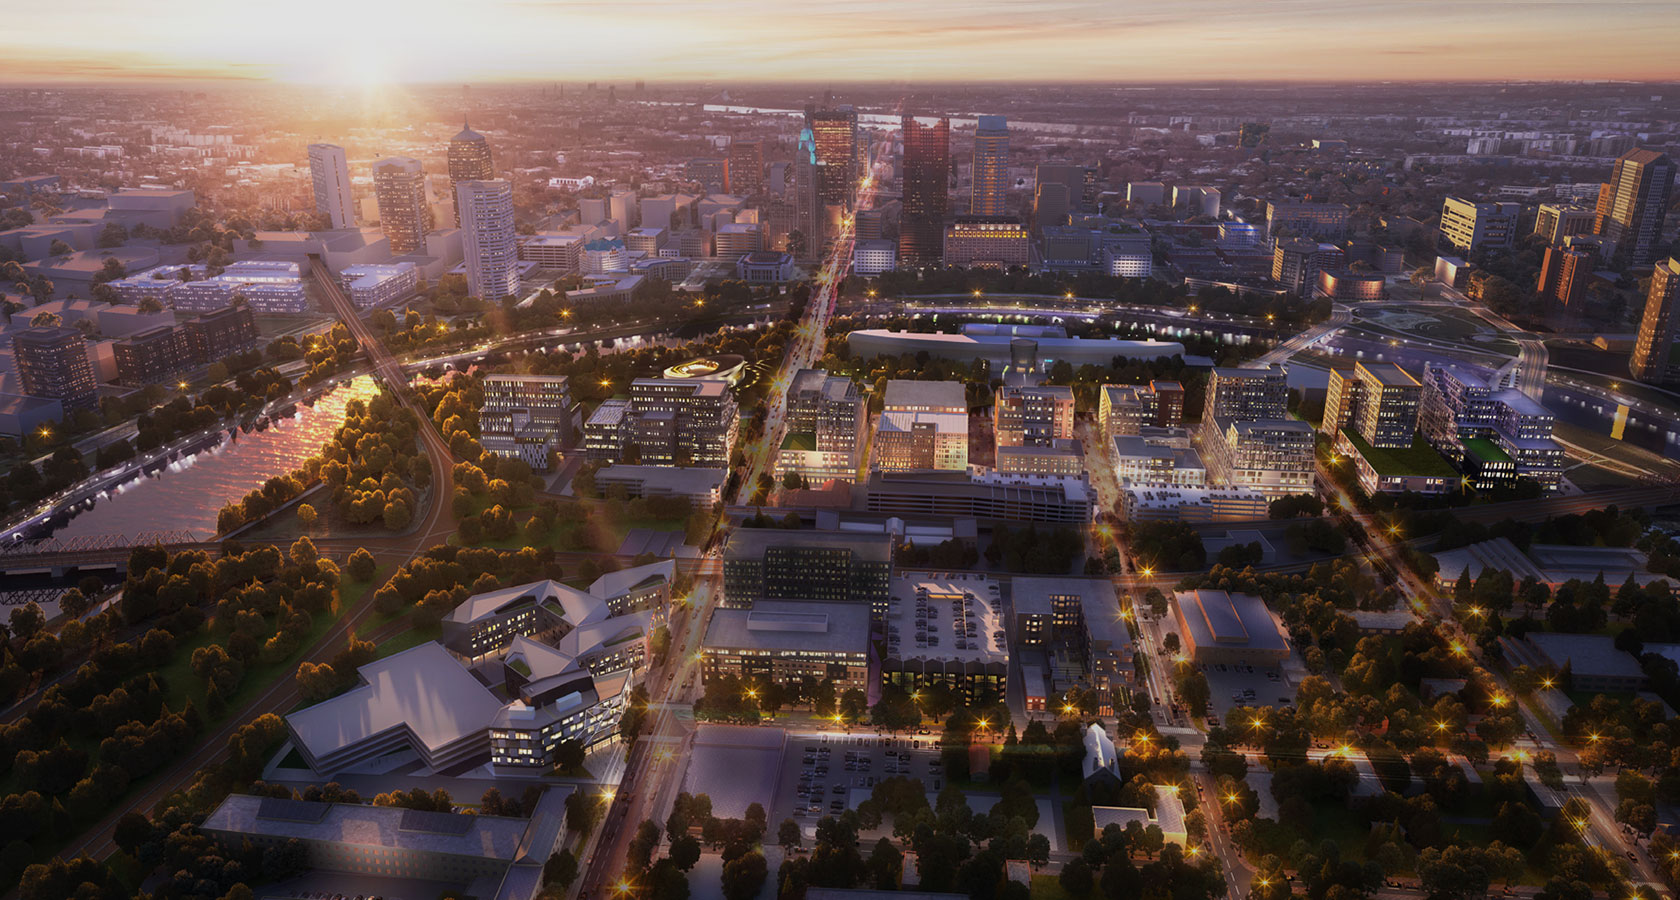 The Peninsula aerial view